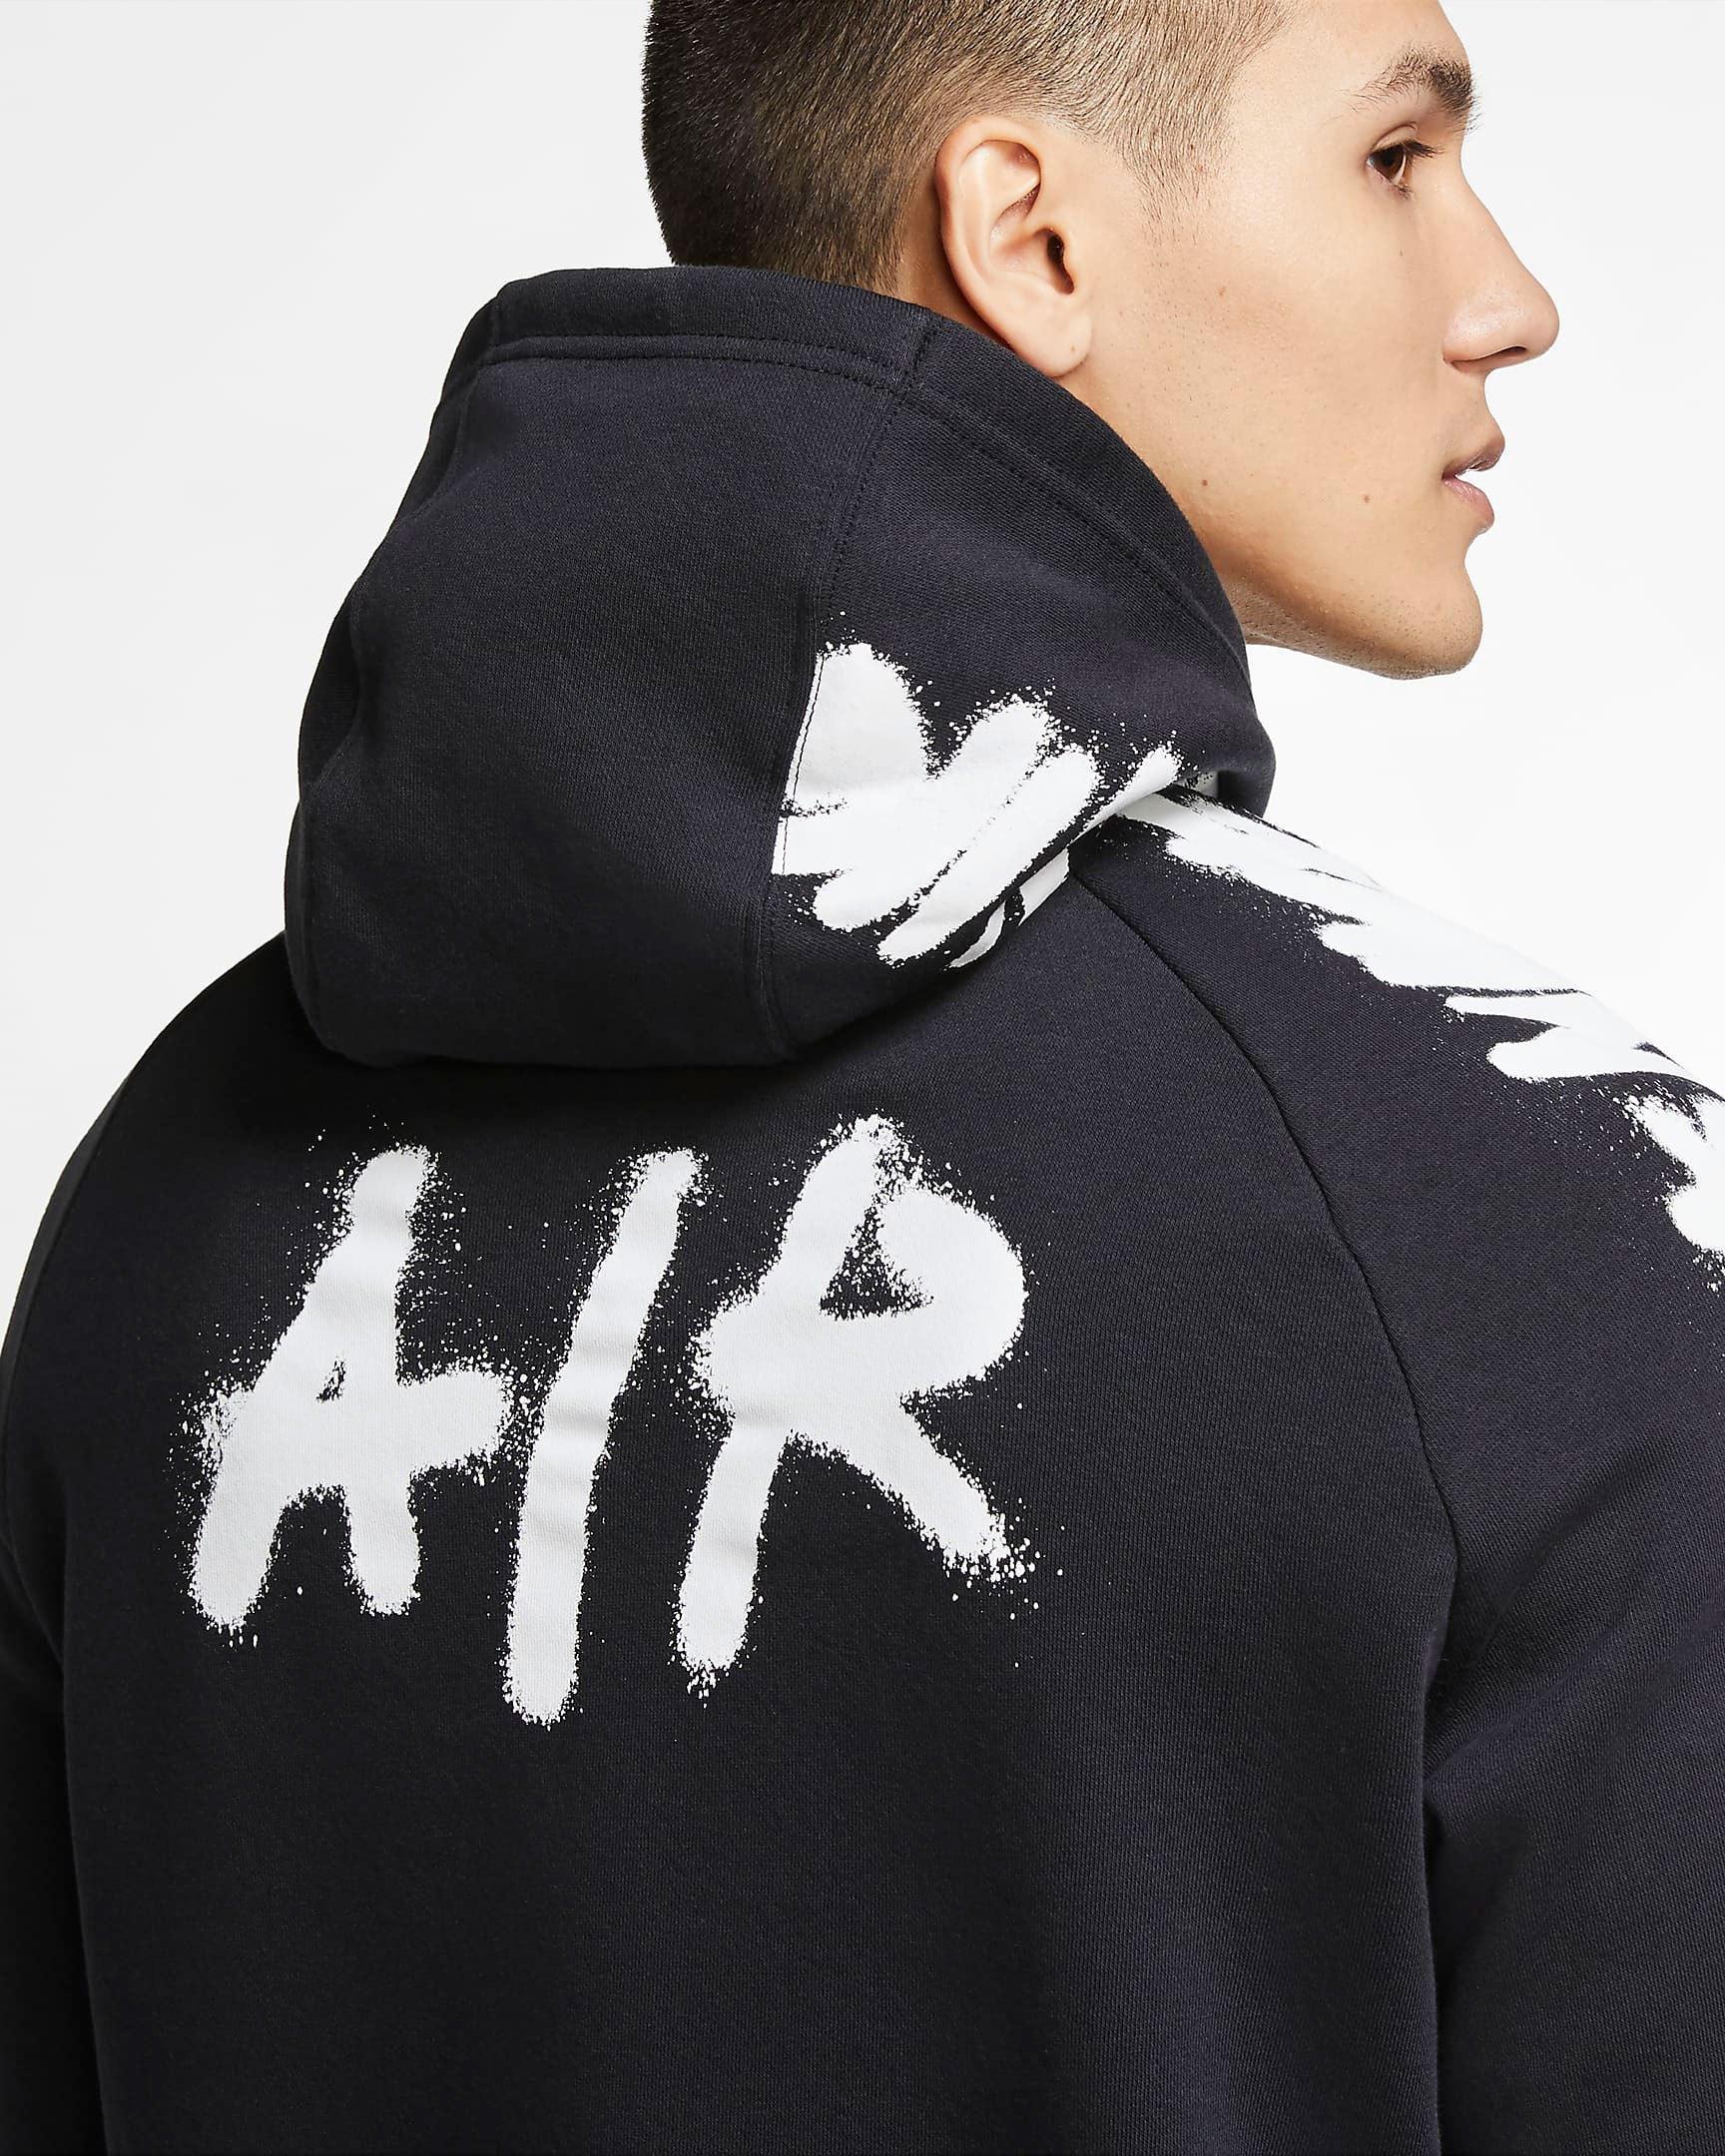 nike-sportswear-spray-paint-club-hoodie-black-3